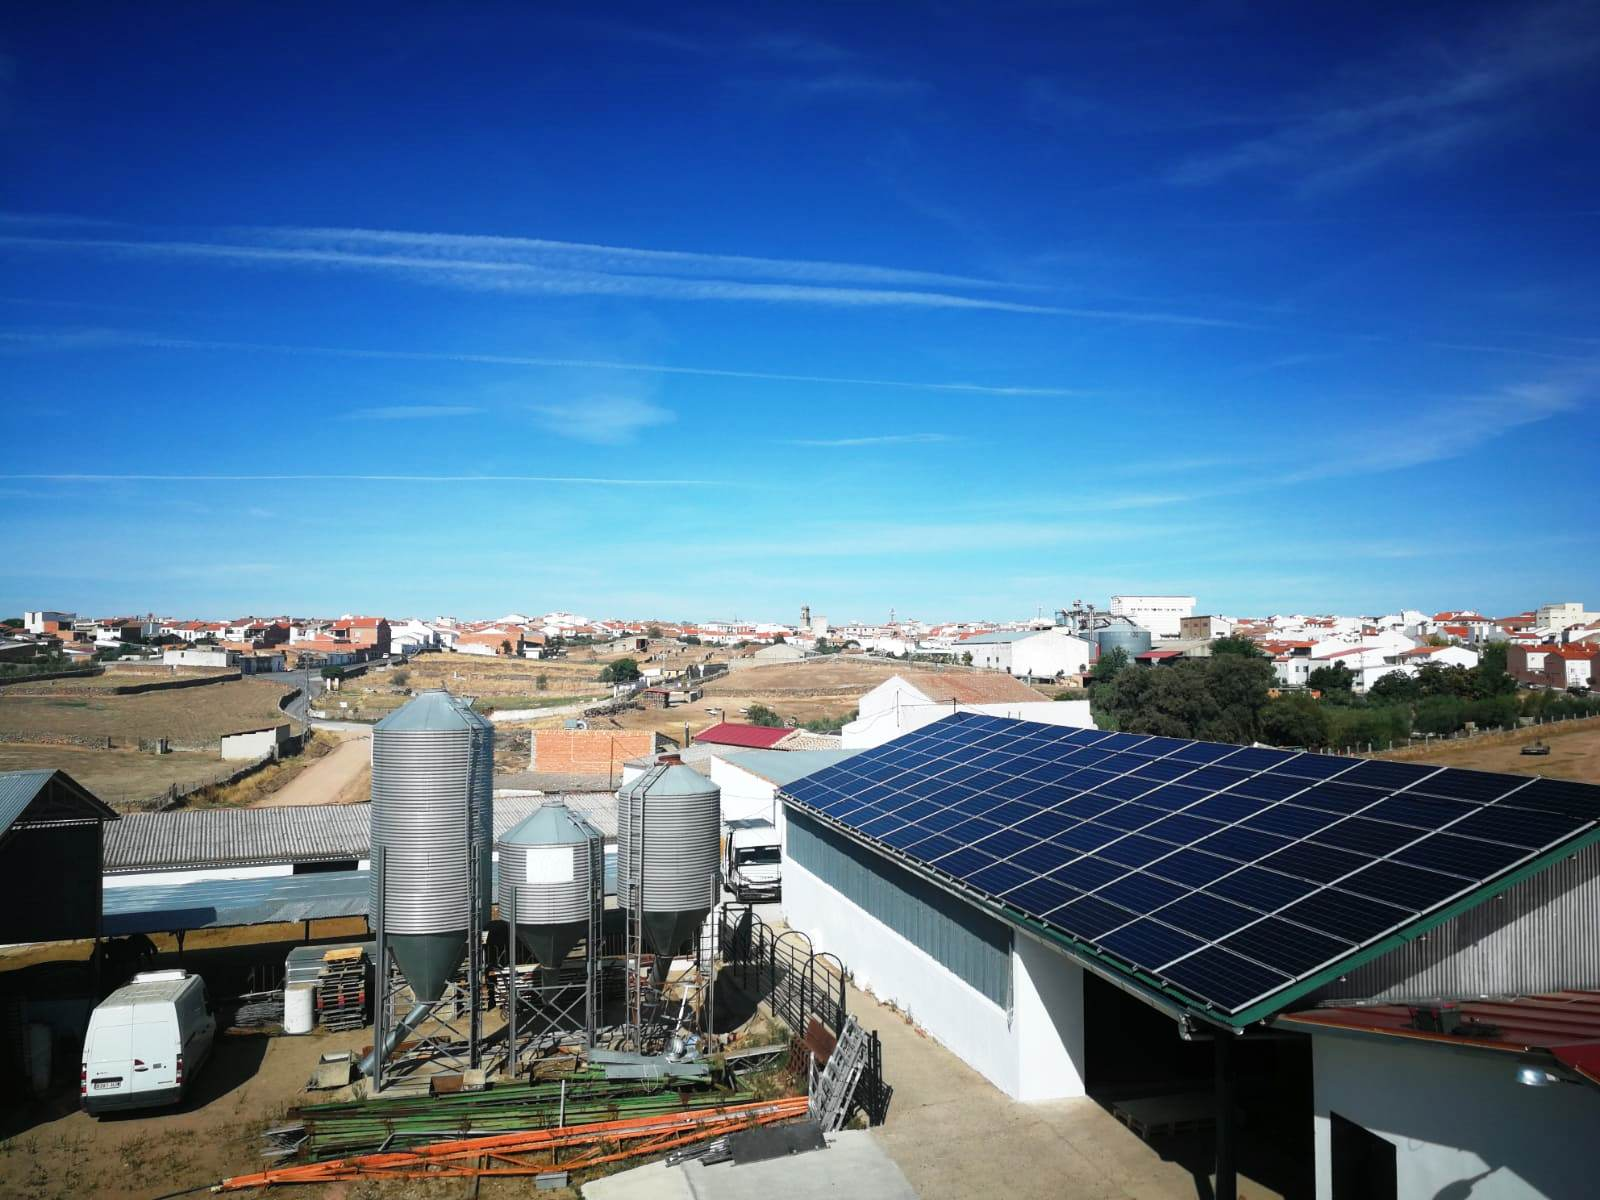 Autoconsumo de 33kWp en Industria Ganadera, Villanueva de Córdoba, Córdoba